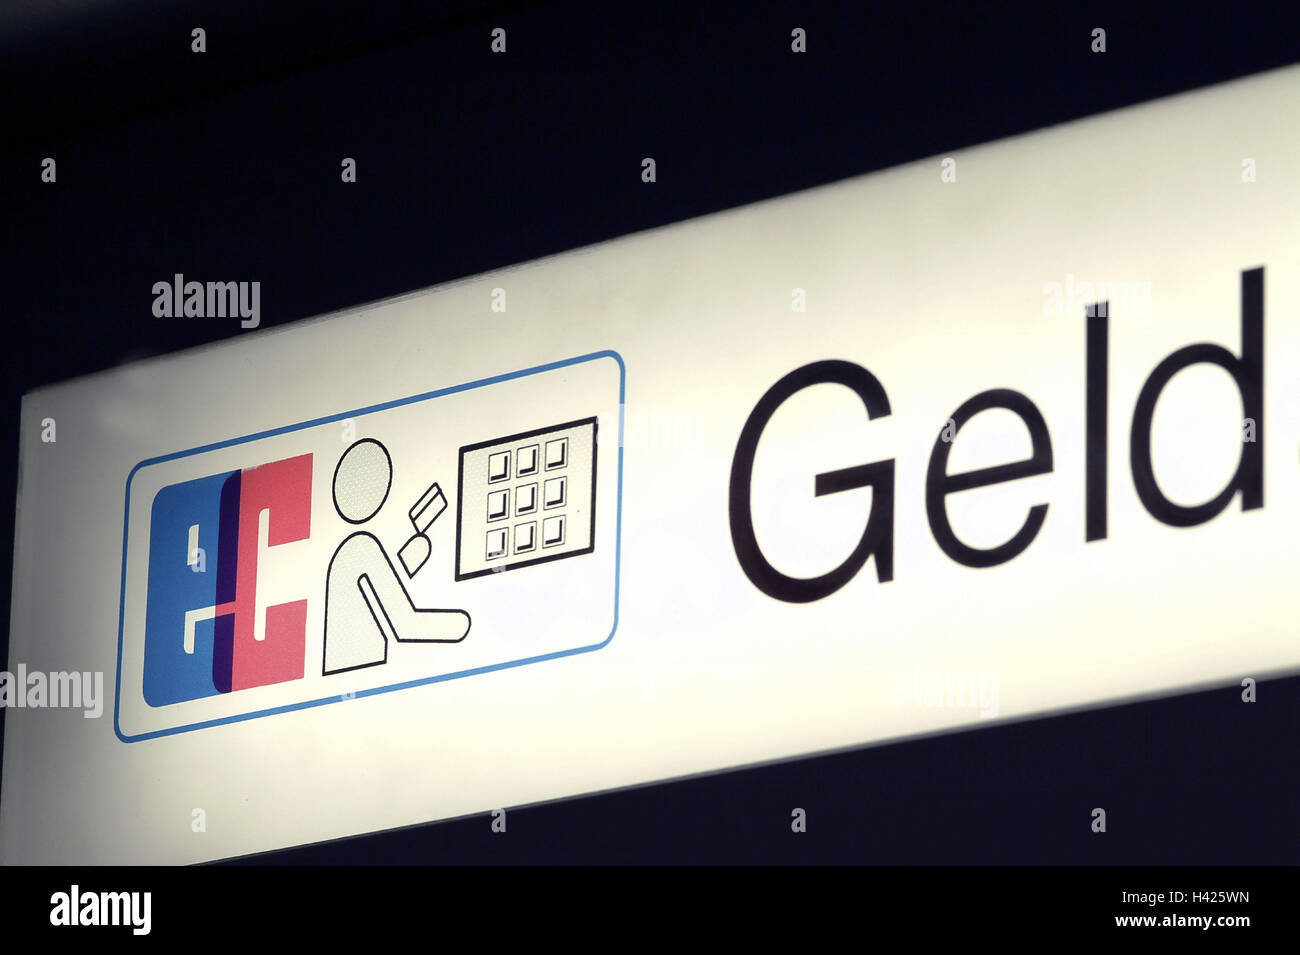 Sign, automatic teller,    Hint, EC, bank, money, finances, EC-Automat, bank vending machine, vending machine, cash, - Stock Image